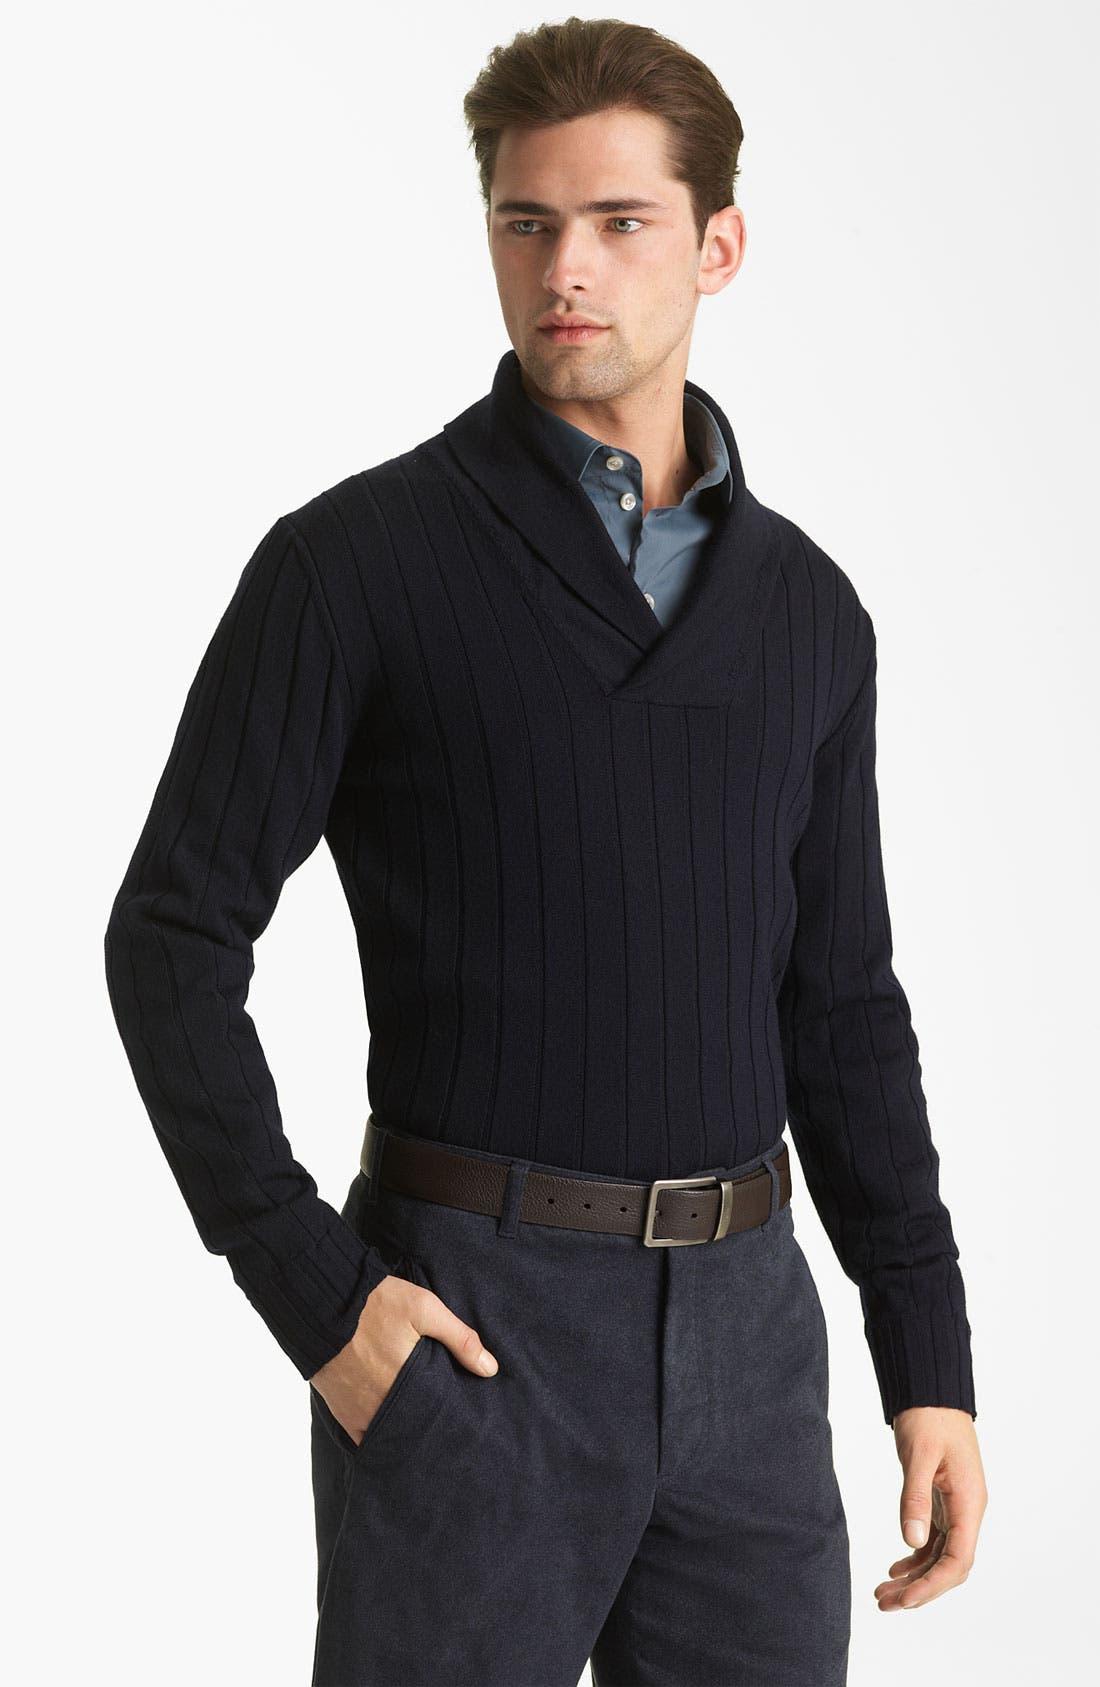 Alternate Image 1 Selected - Armani Collezioni Wool Shawl Collar Sweater